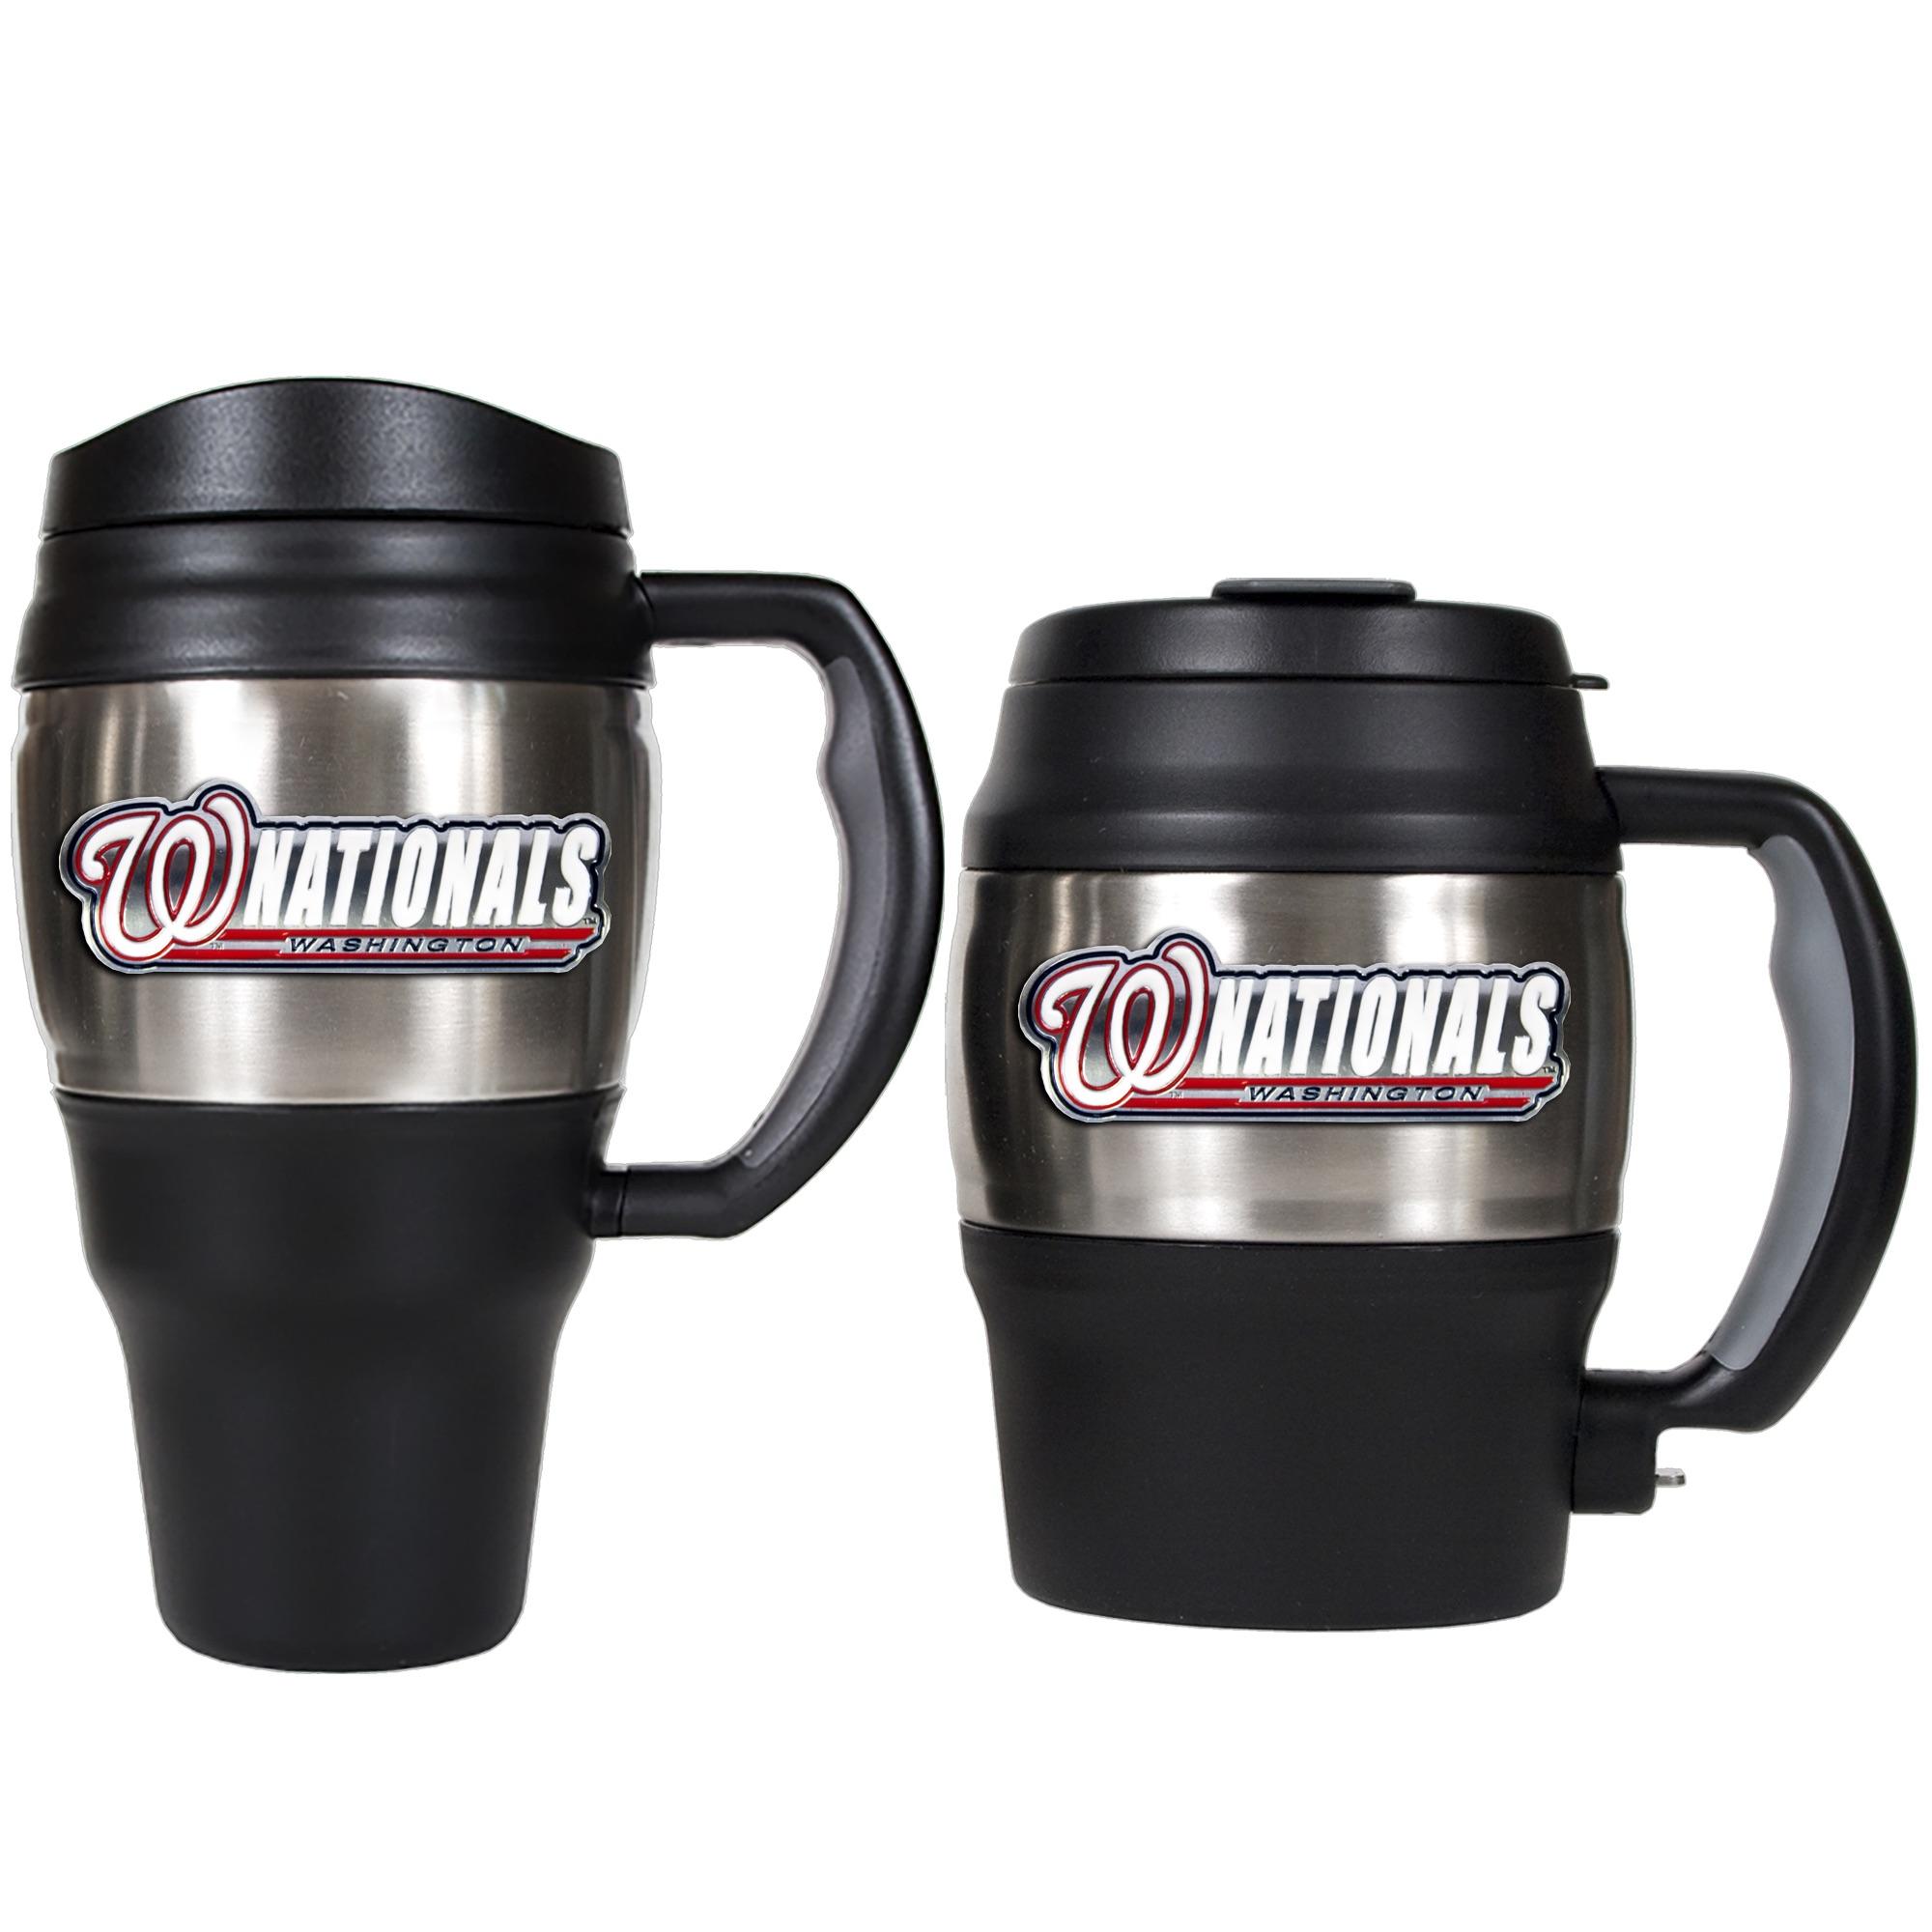 Washington Nationals 2-Piece Insulated Travel Mug Set - No Size